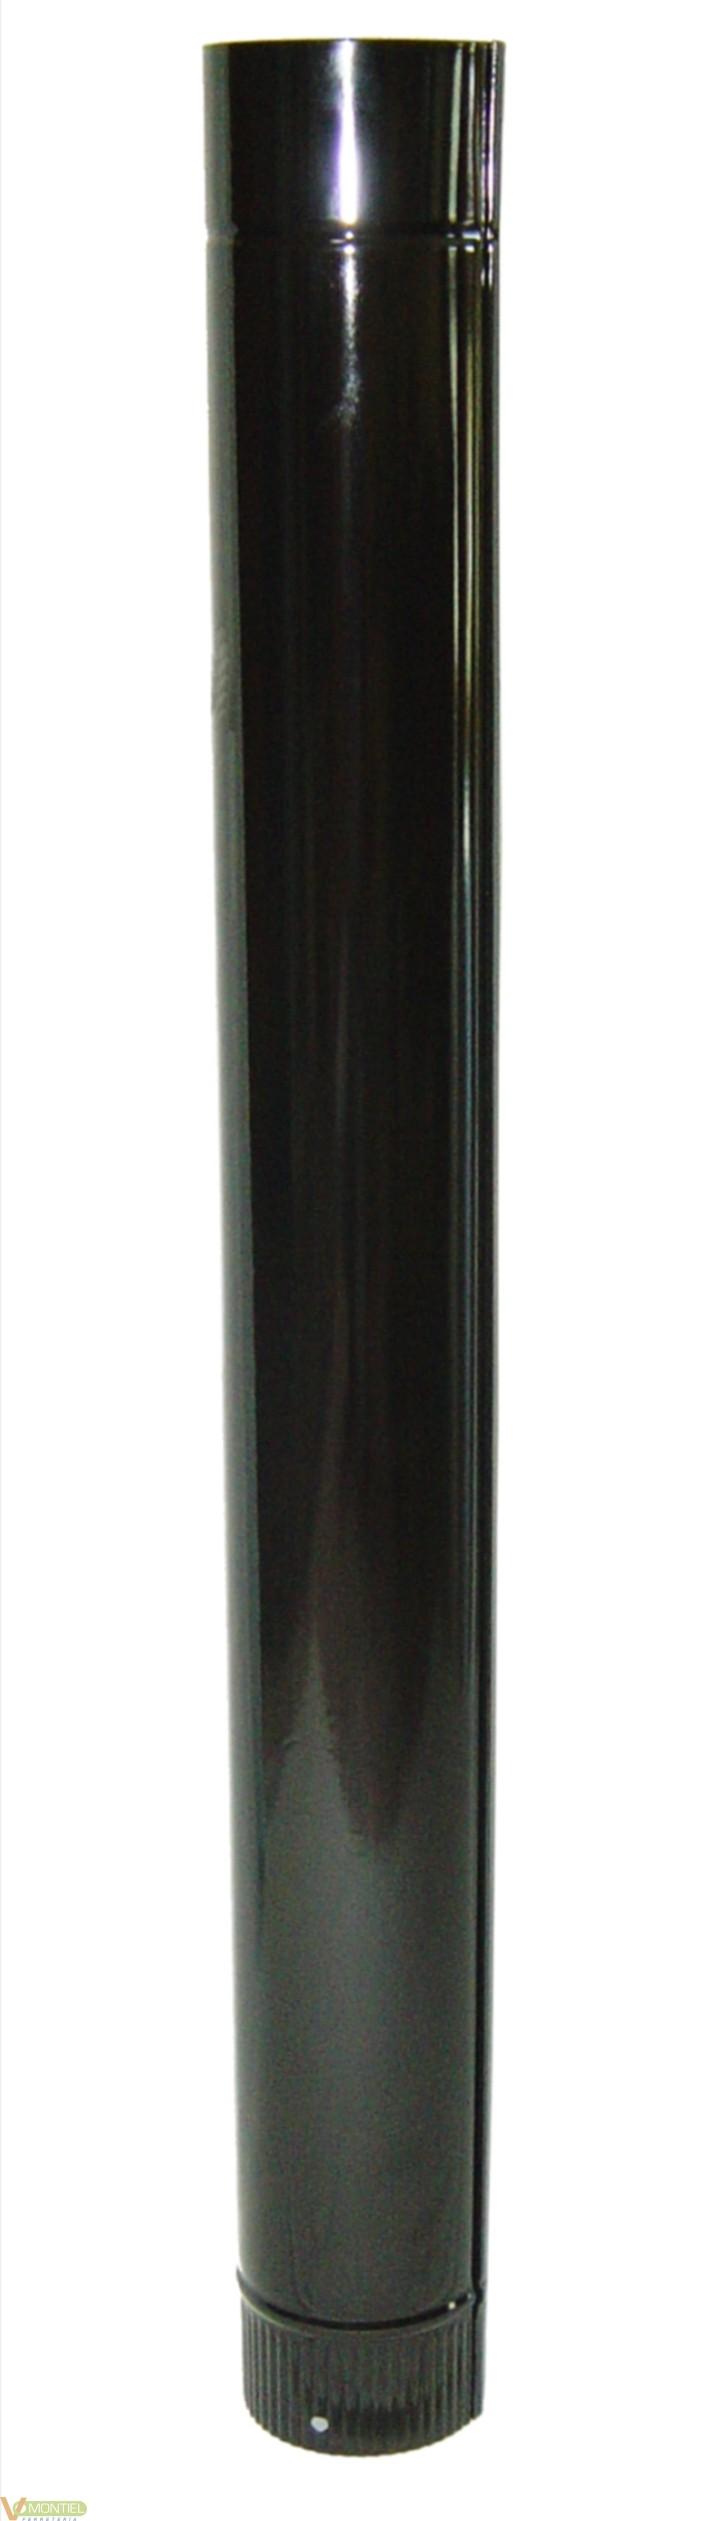 Tubo estufa 120mm a/esm-0